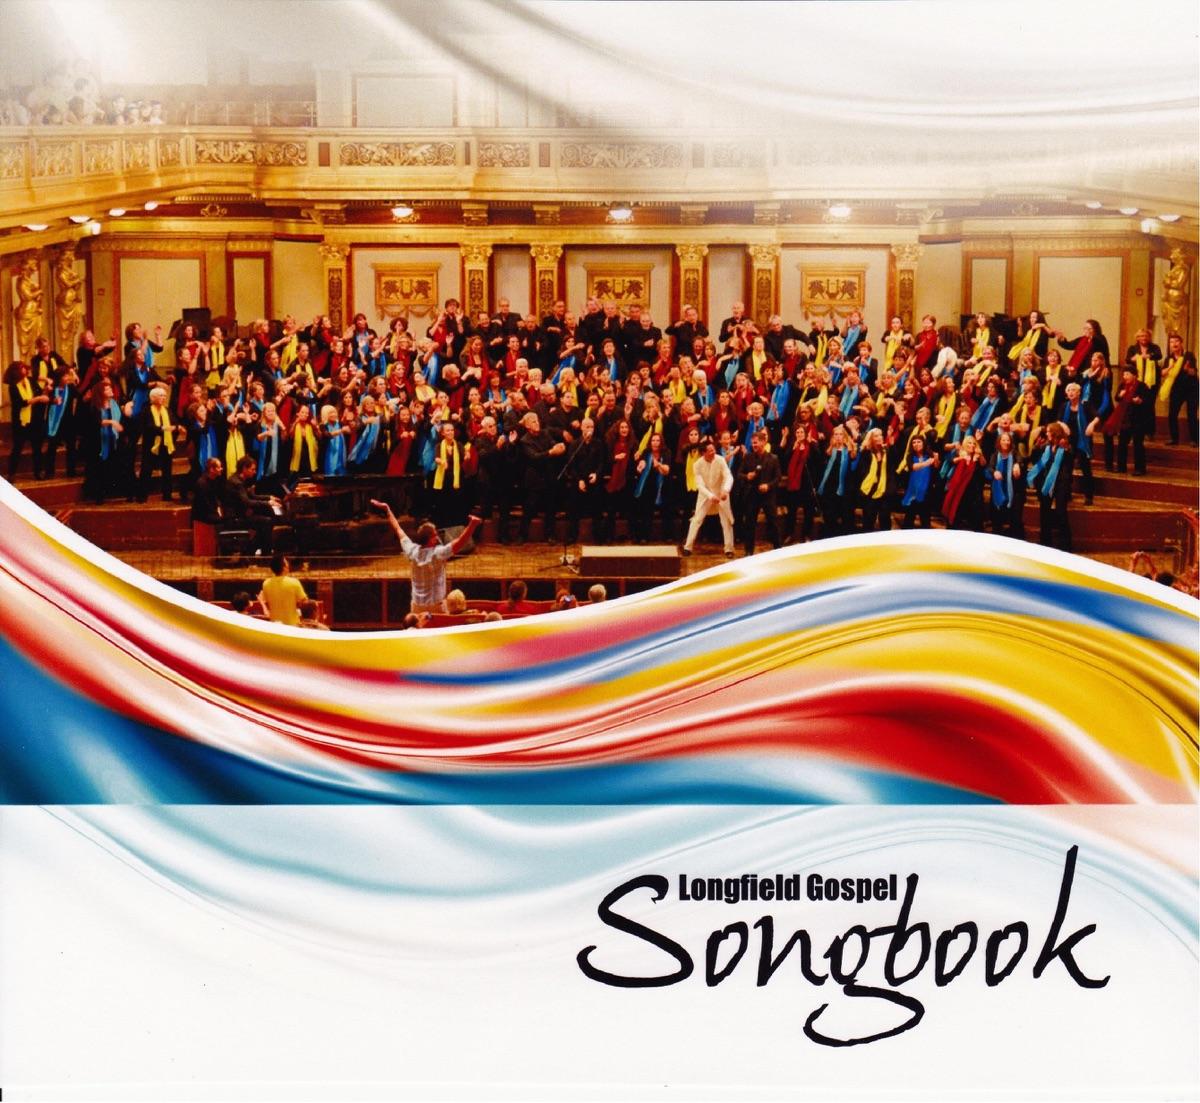 Songbook Longfield Gospel CD cover